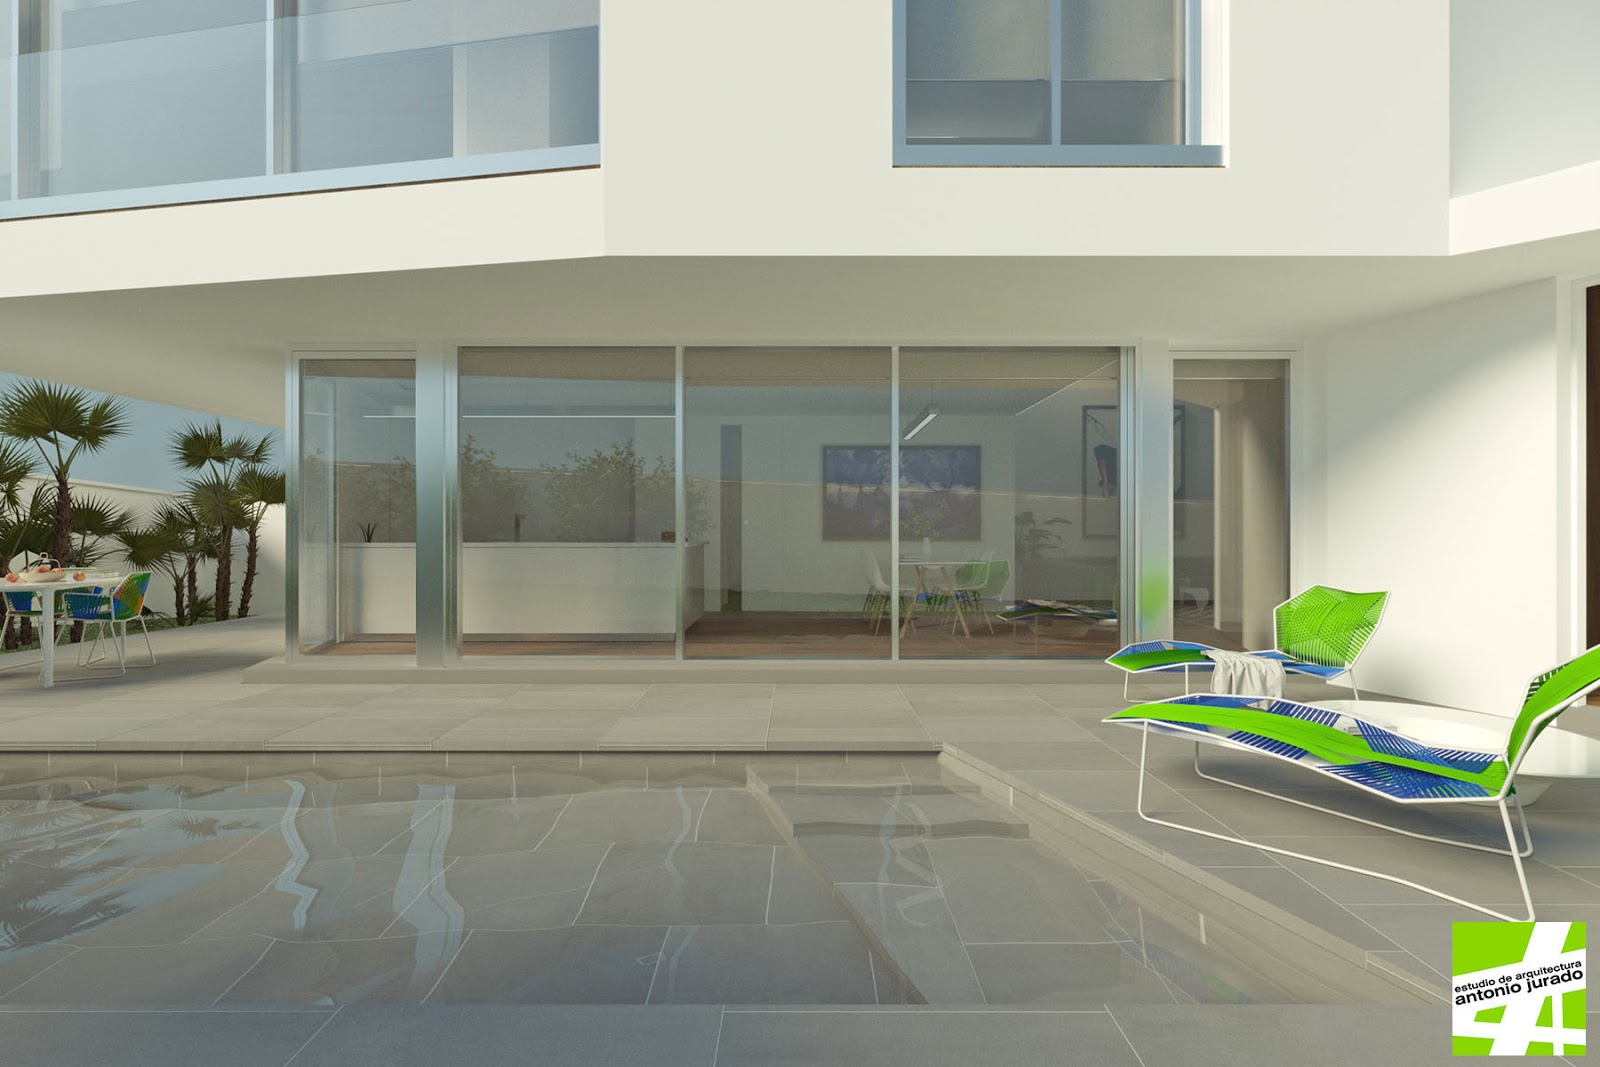 casa-ob-house-alhaurin-malaga-arquitecto-antonio-jurado-03